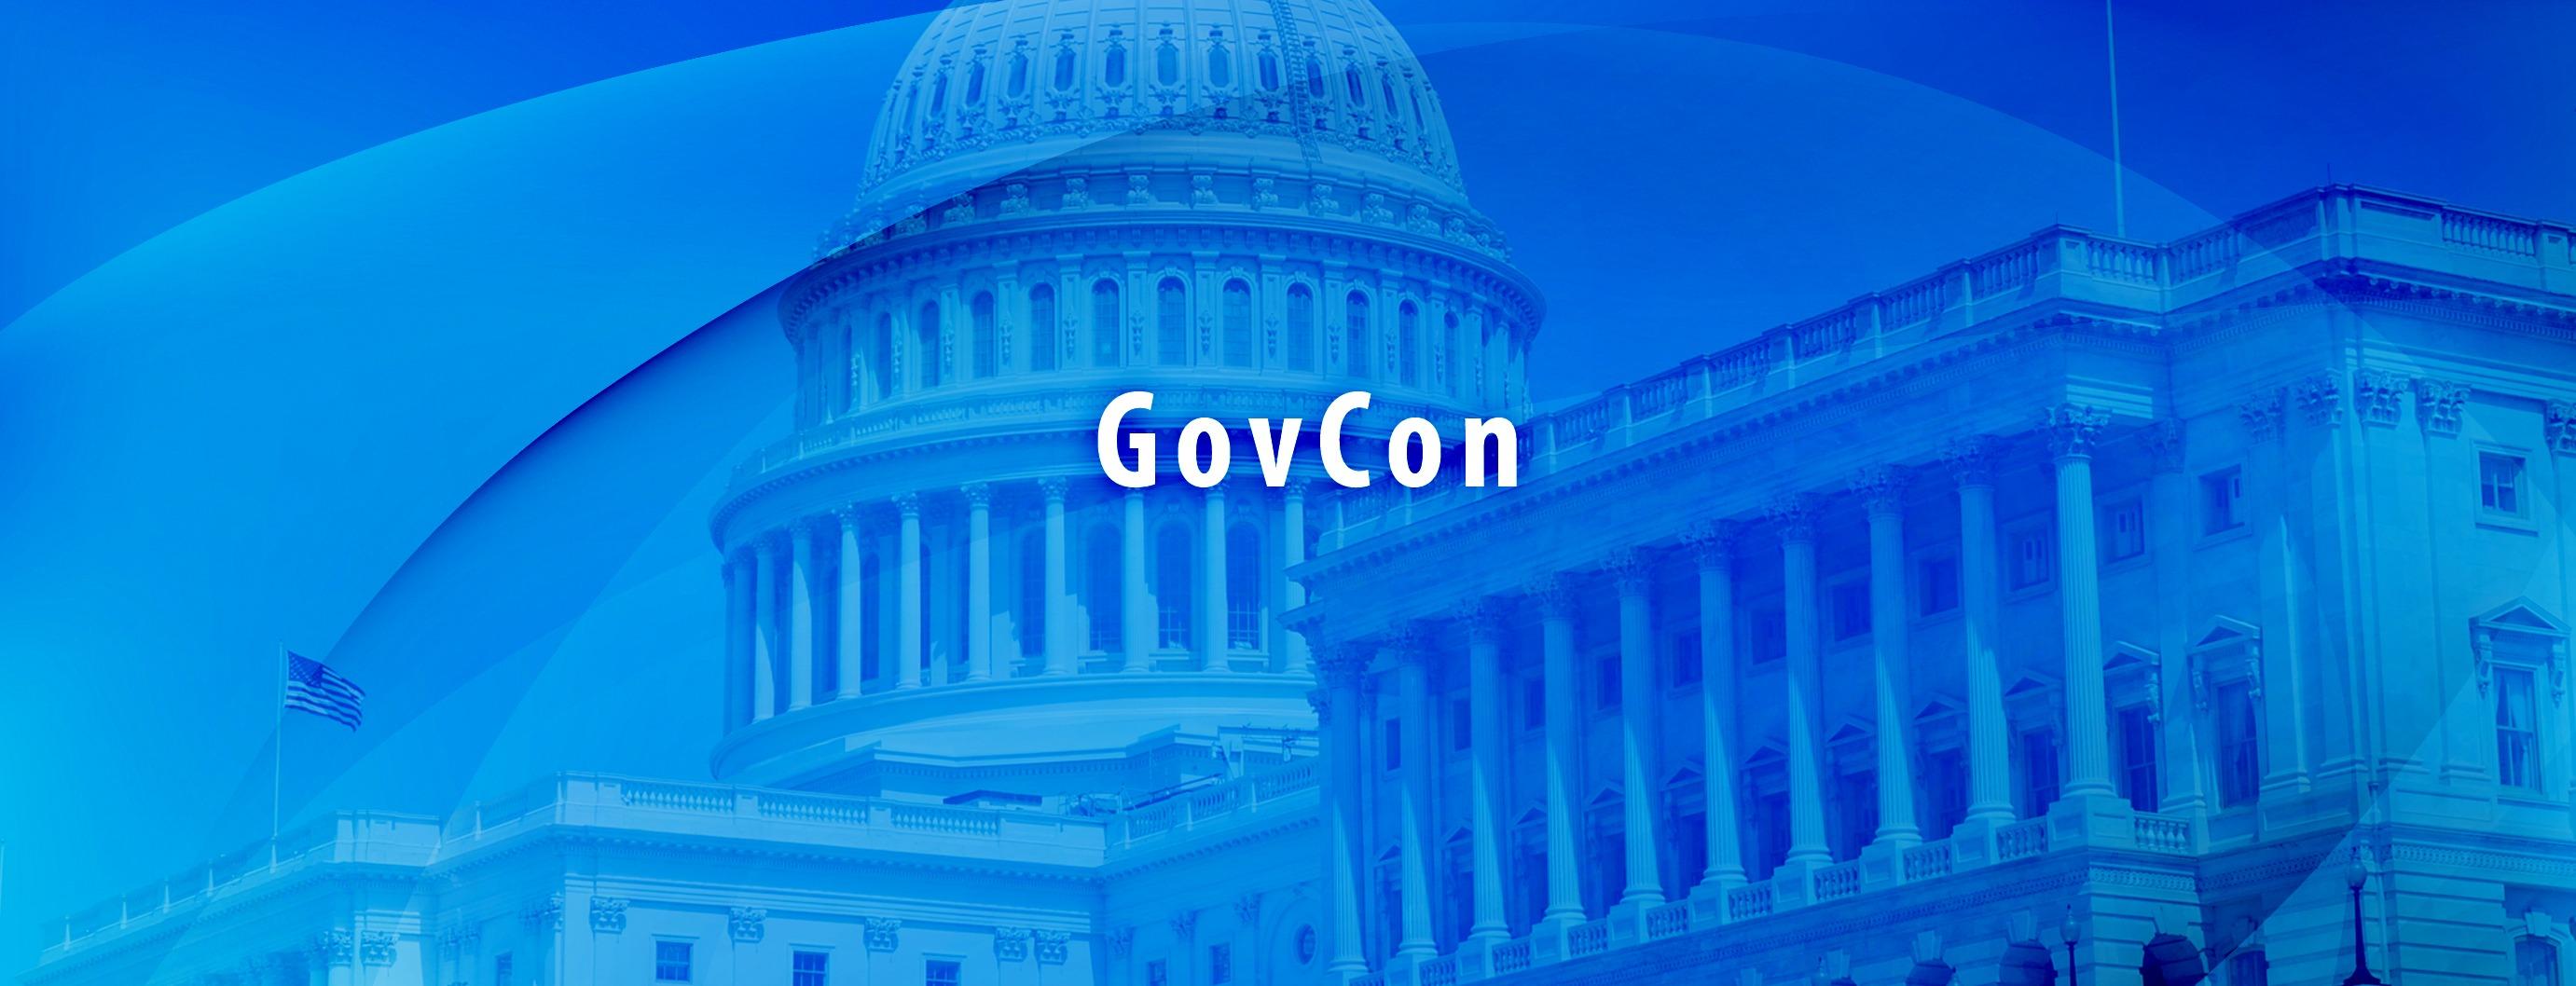 Govcon Rose Financial